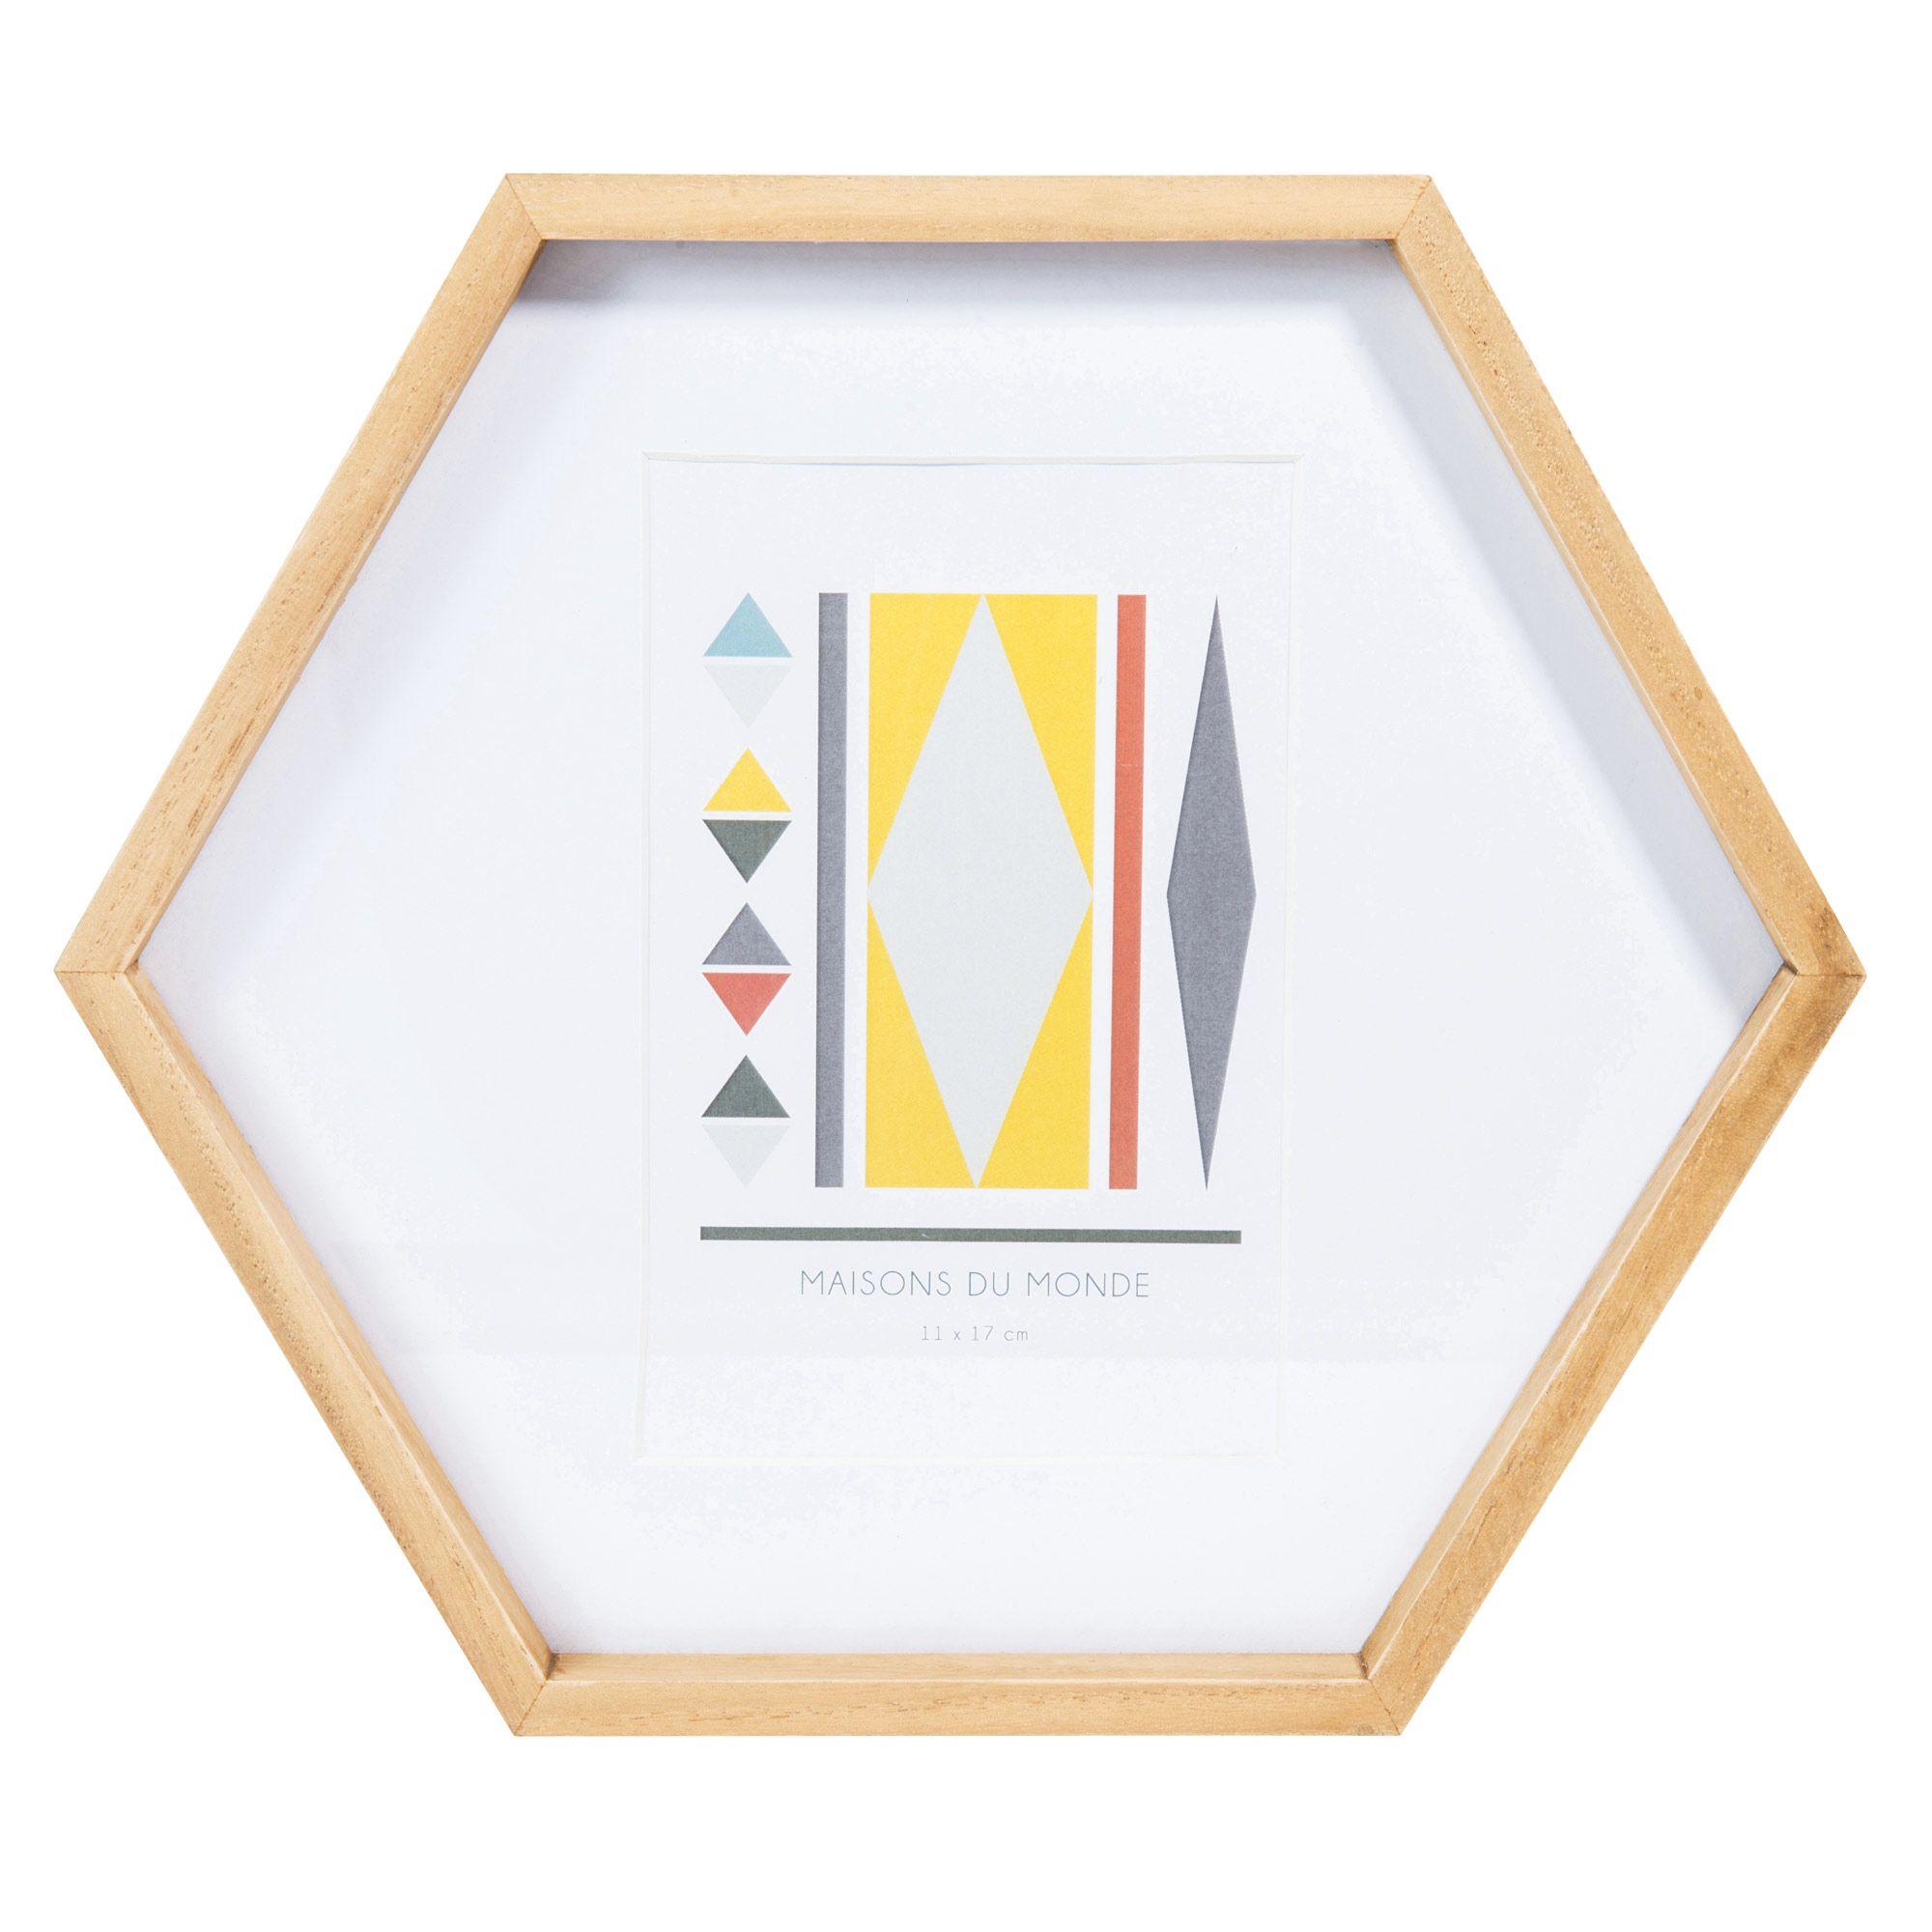 Cornice foto esagonale in legno 26 x 30 cm VINTAGE